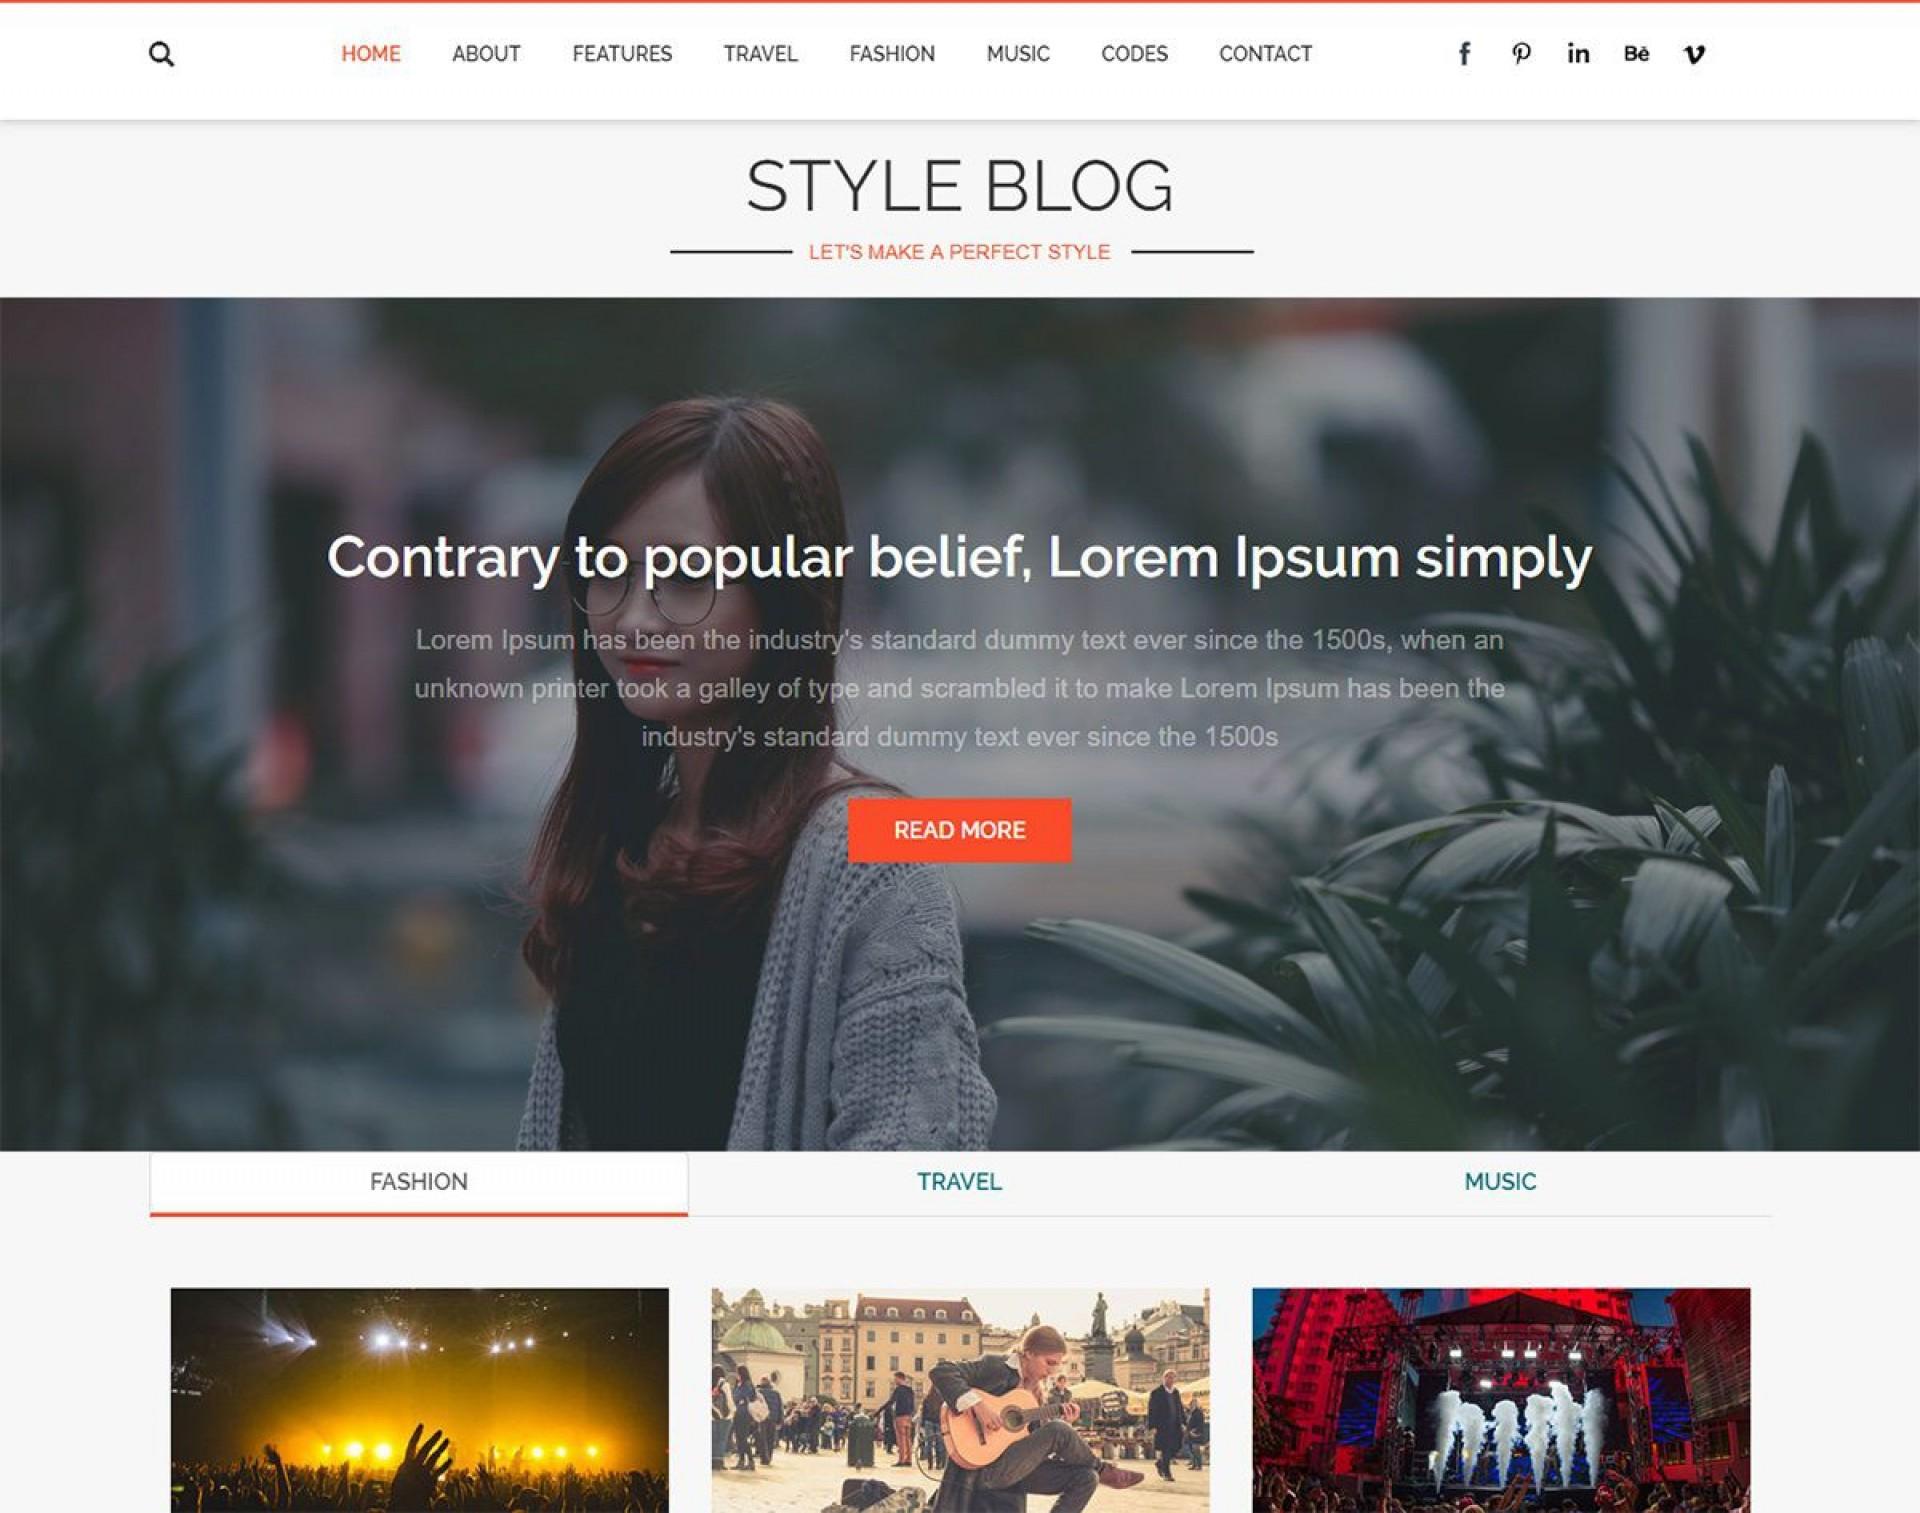 005 Stirring Best Free Responsive Blogging Theme Highest Quality  Blogger Template 2019 Wordpres Blog Download1920